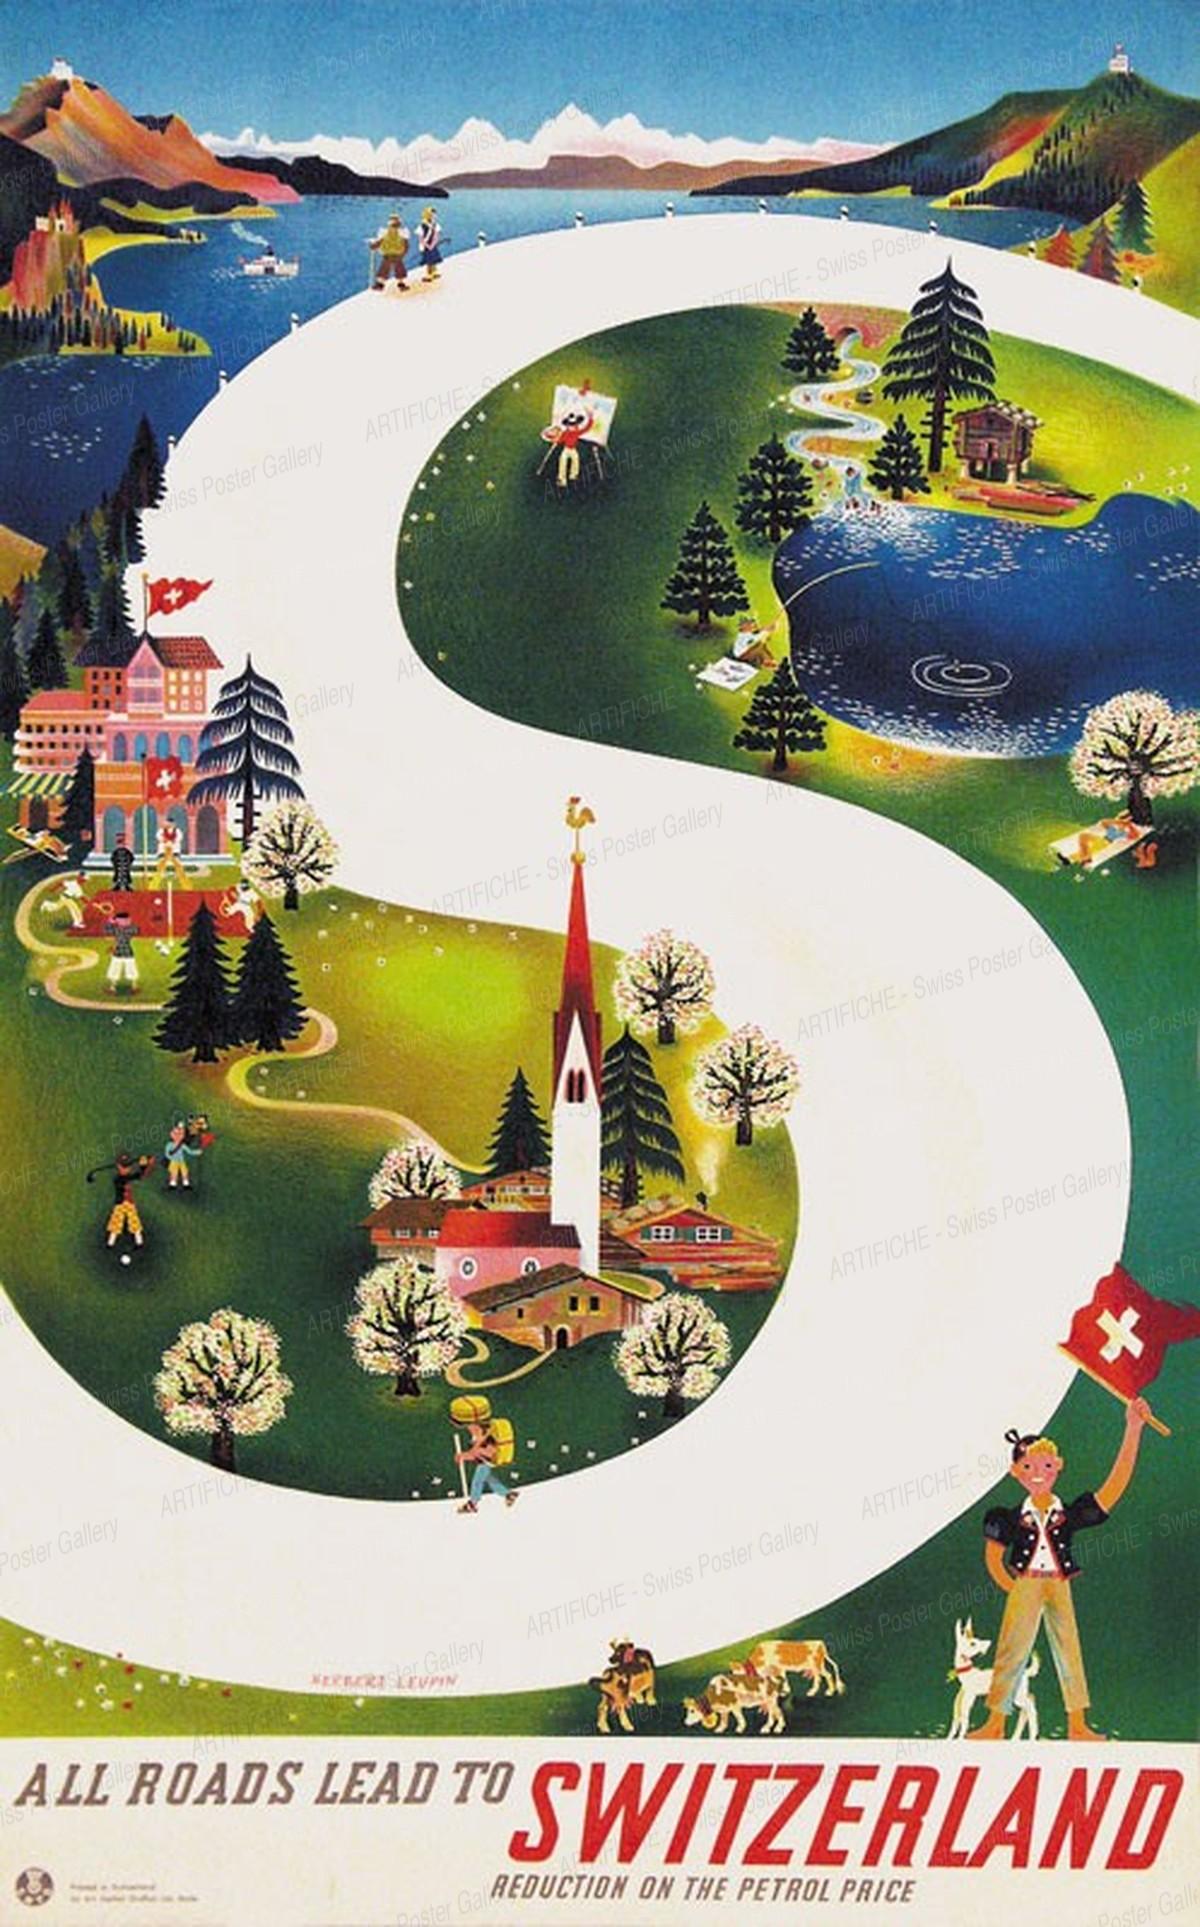 All roads lead to SWITZERLAND, Herbert Leupin